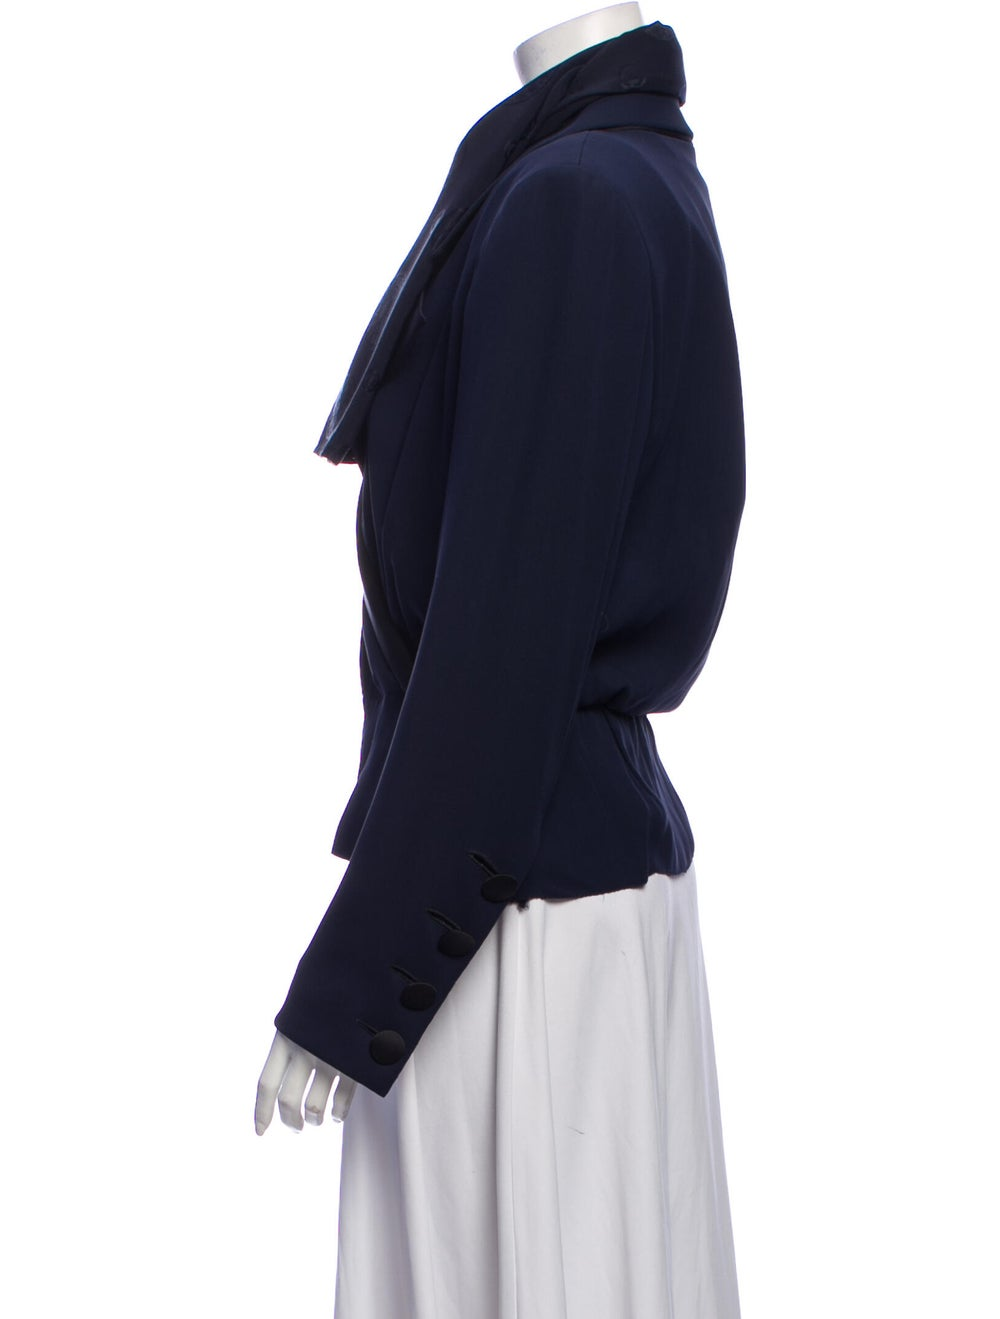 Yves Saint Laurent Vintage 1970's Evening Jacket … - image 2